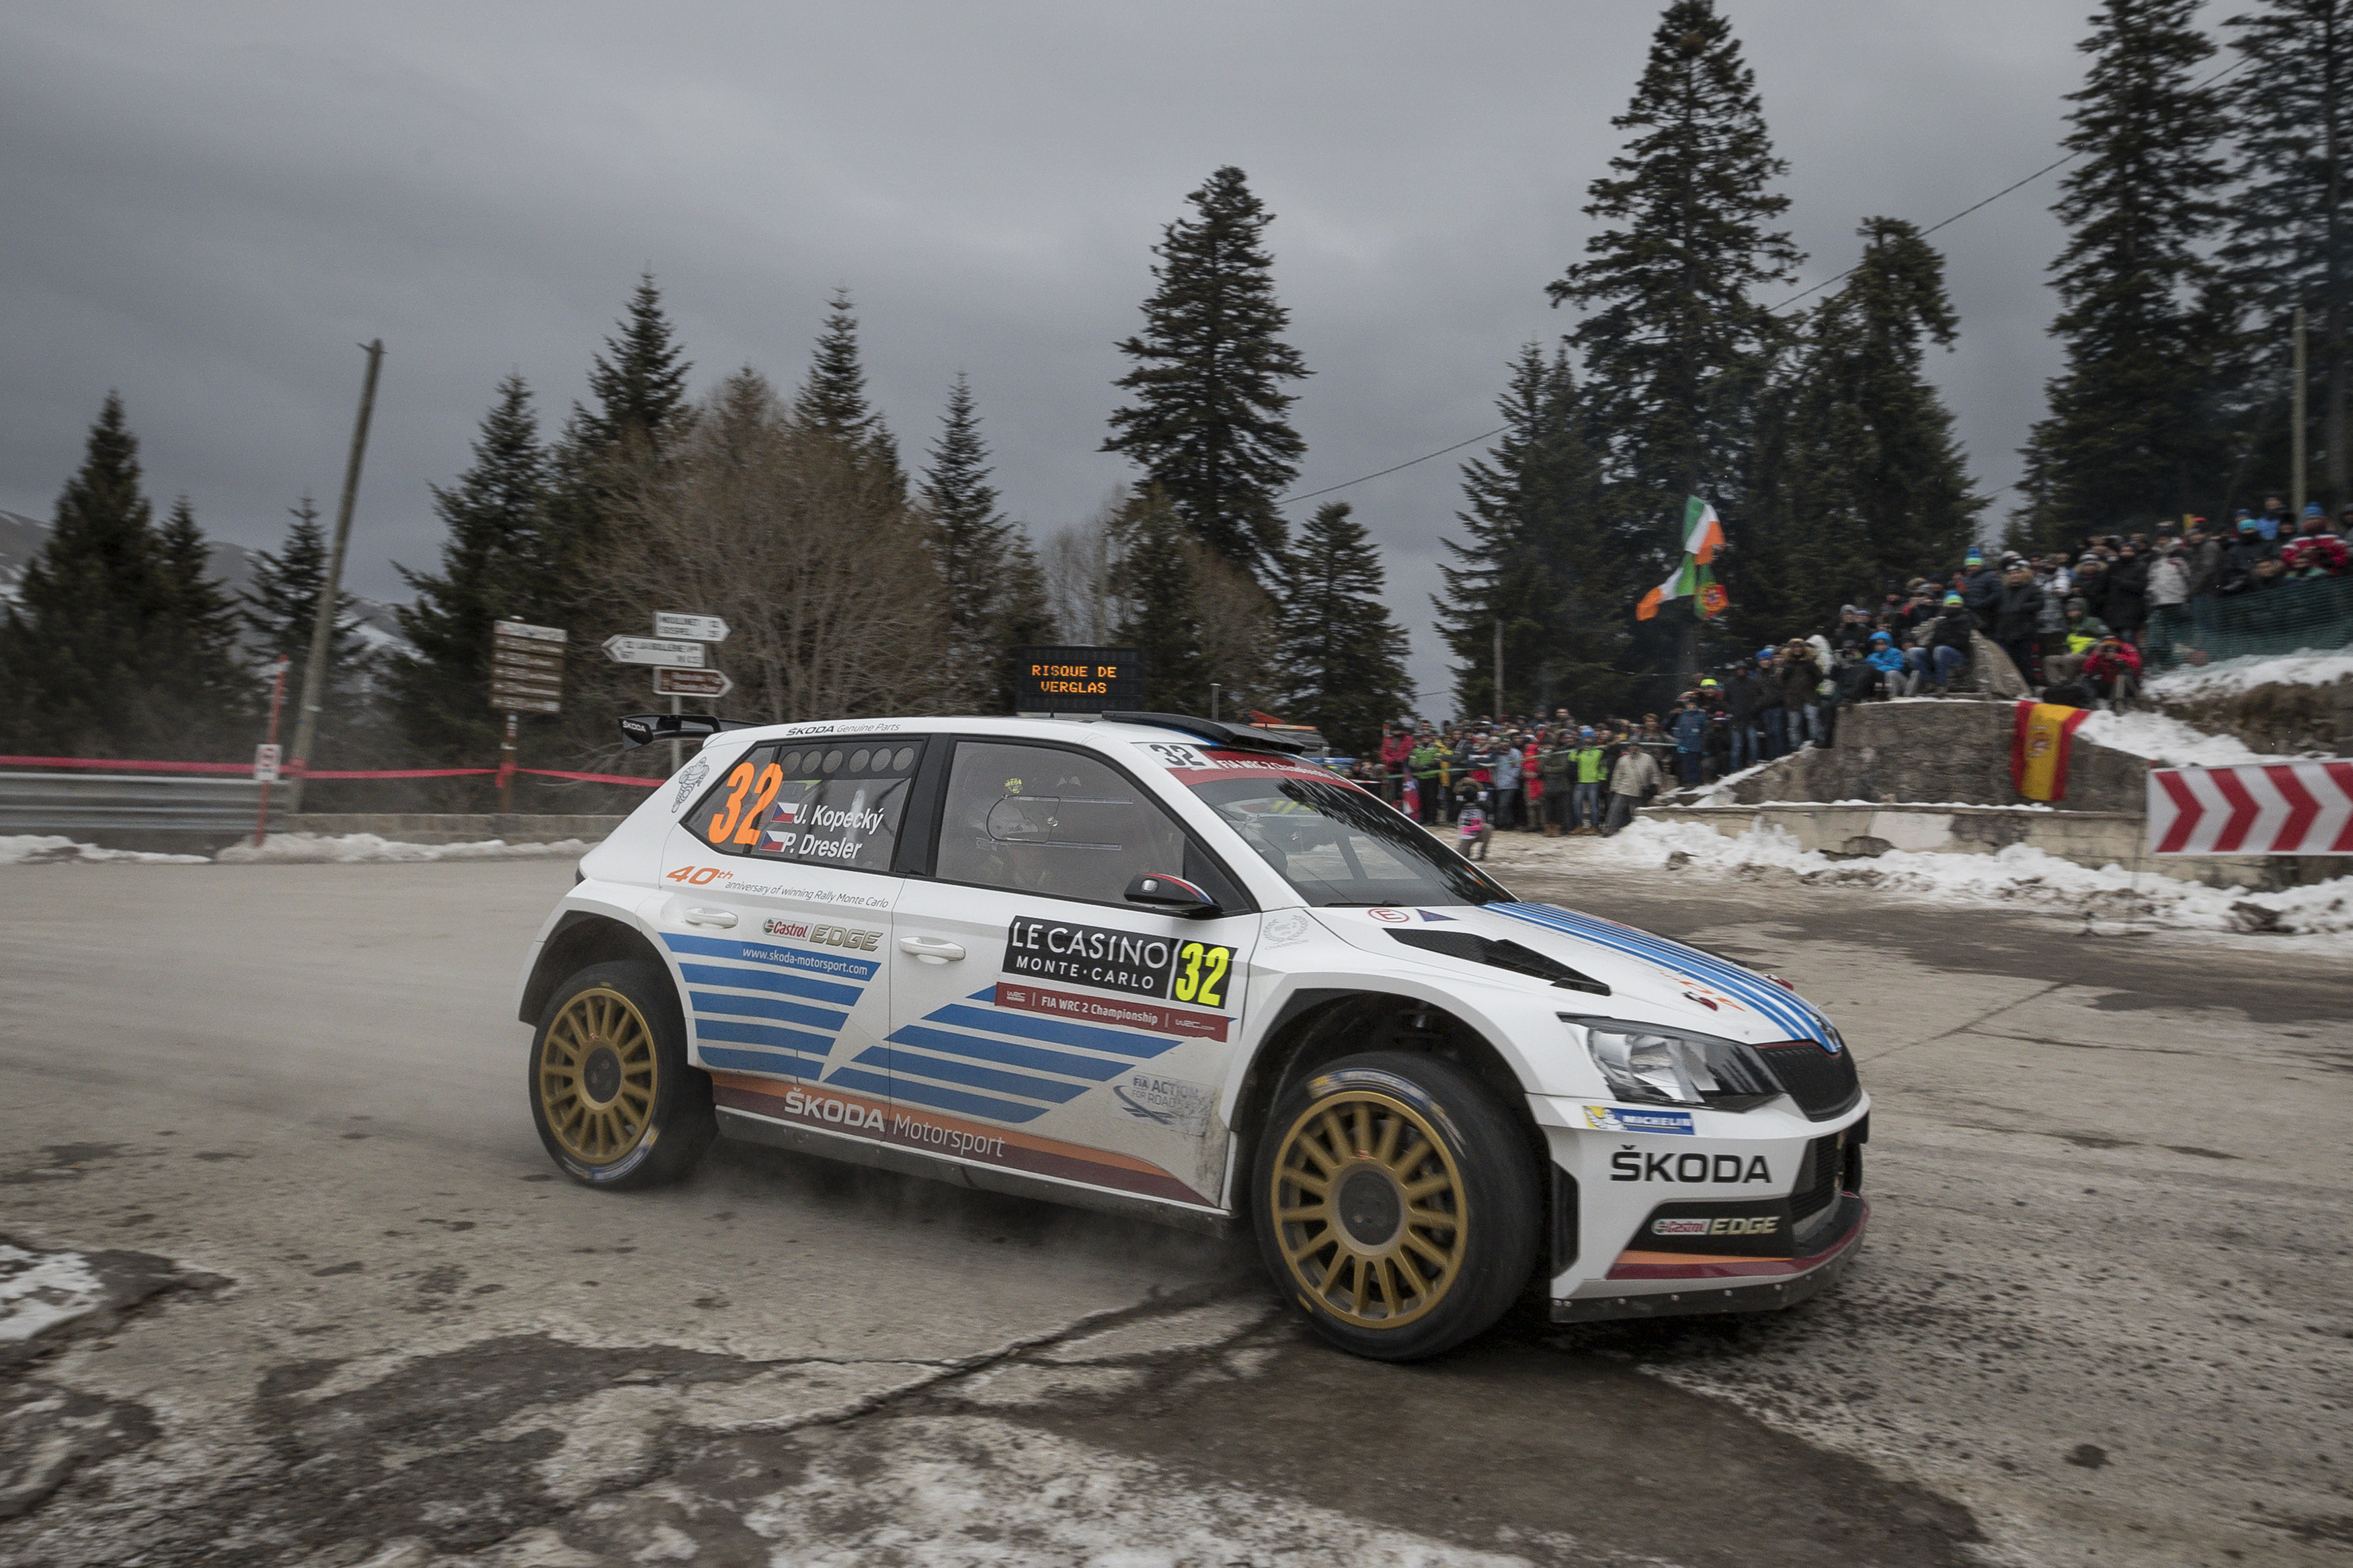 Rally Monte Carlo 2017 - ŠKODA Storyboard